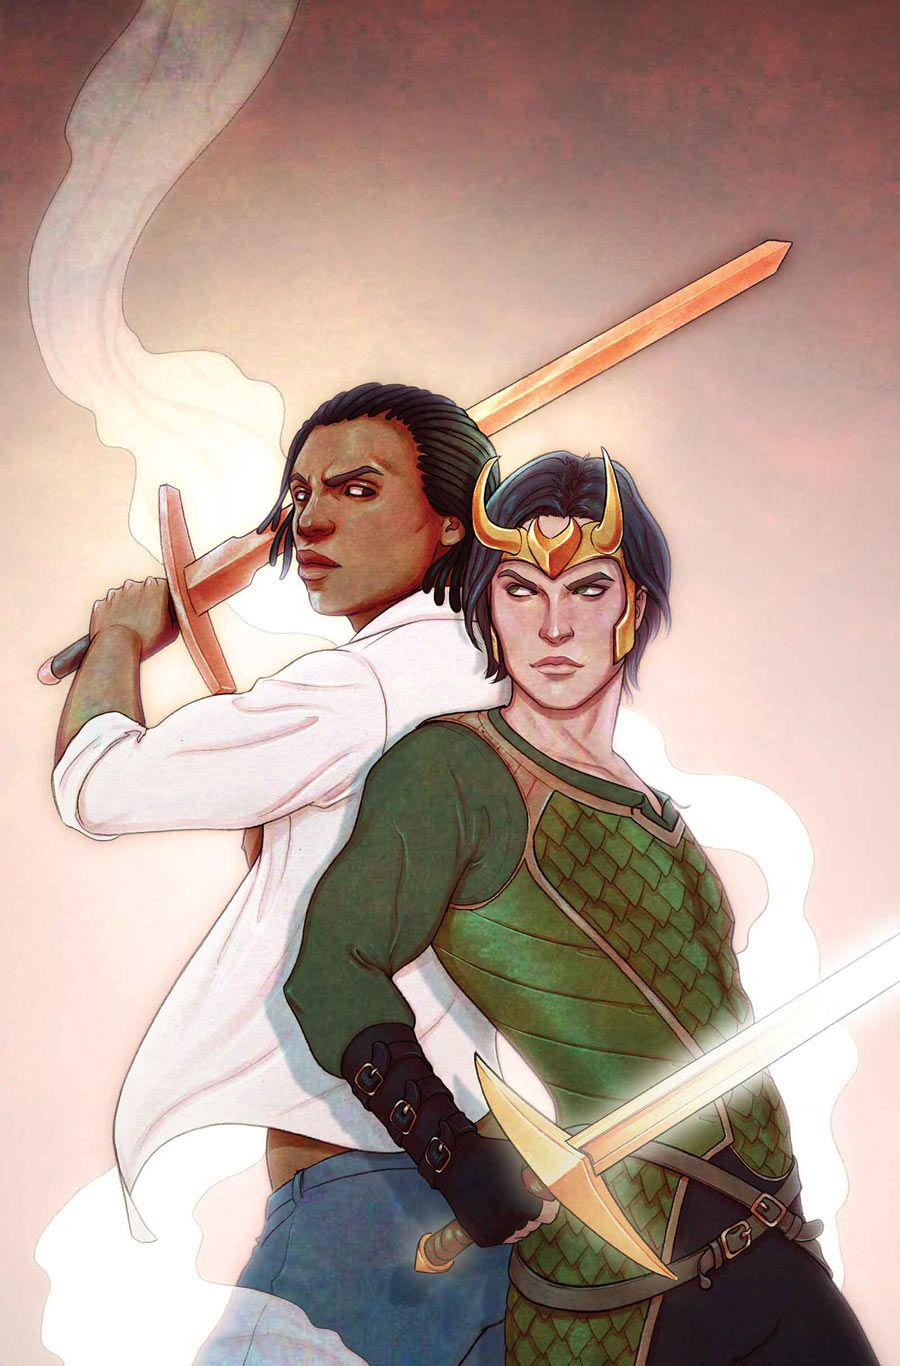 Jenny Frison Loki Agent Of Asgard 4 Loki Cosplay Loki Marvel Asgard Marvel